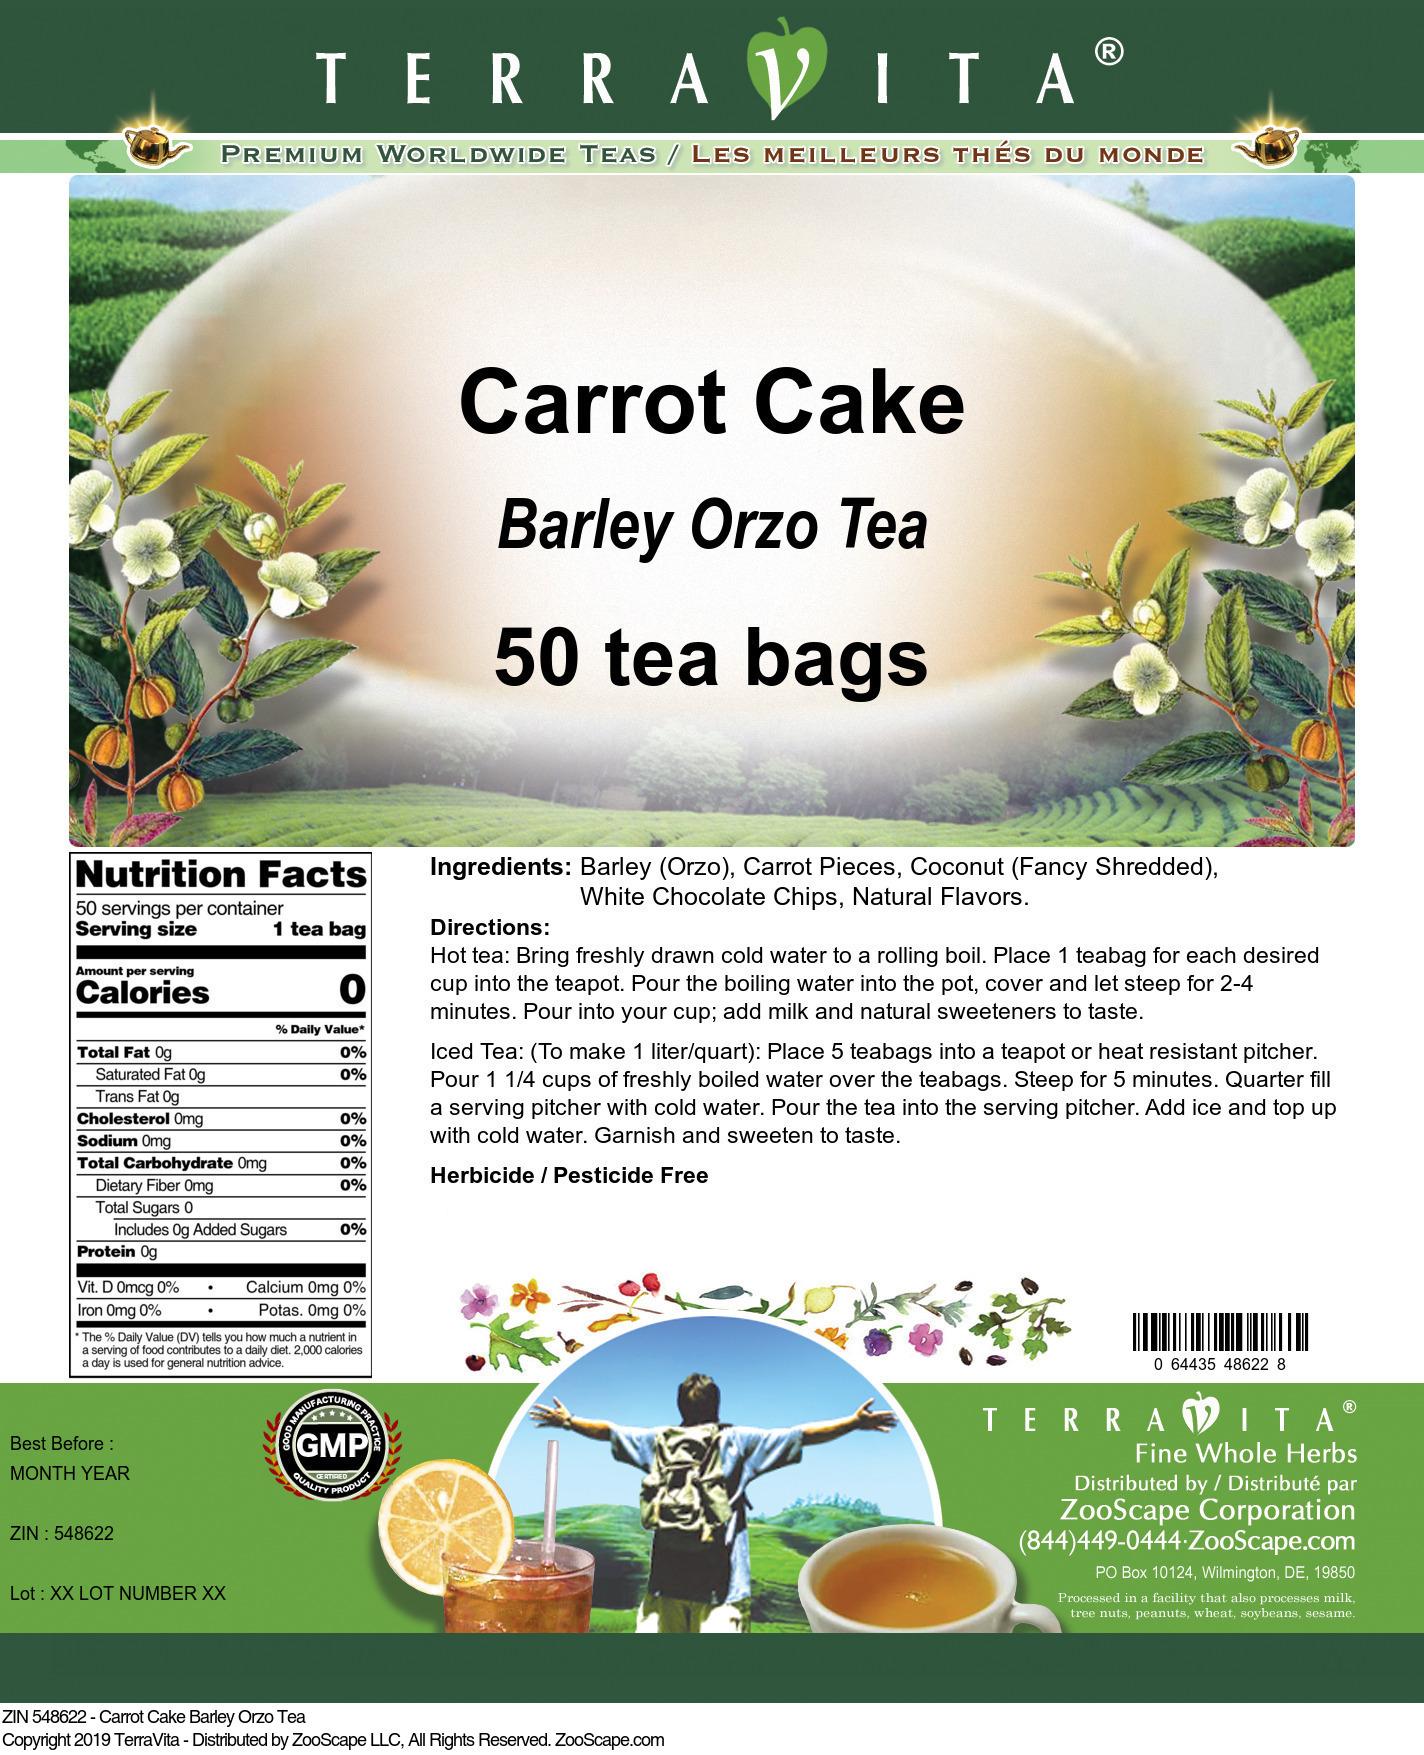 Carrot Cake Barley Orzo